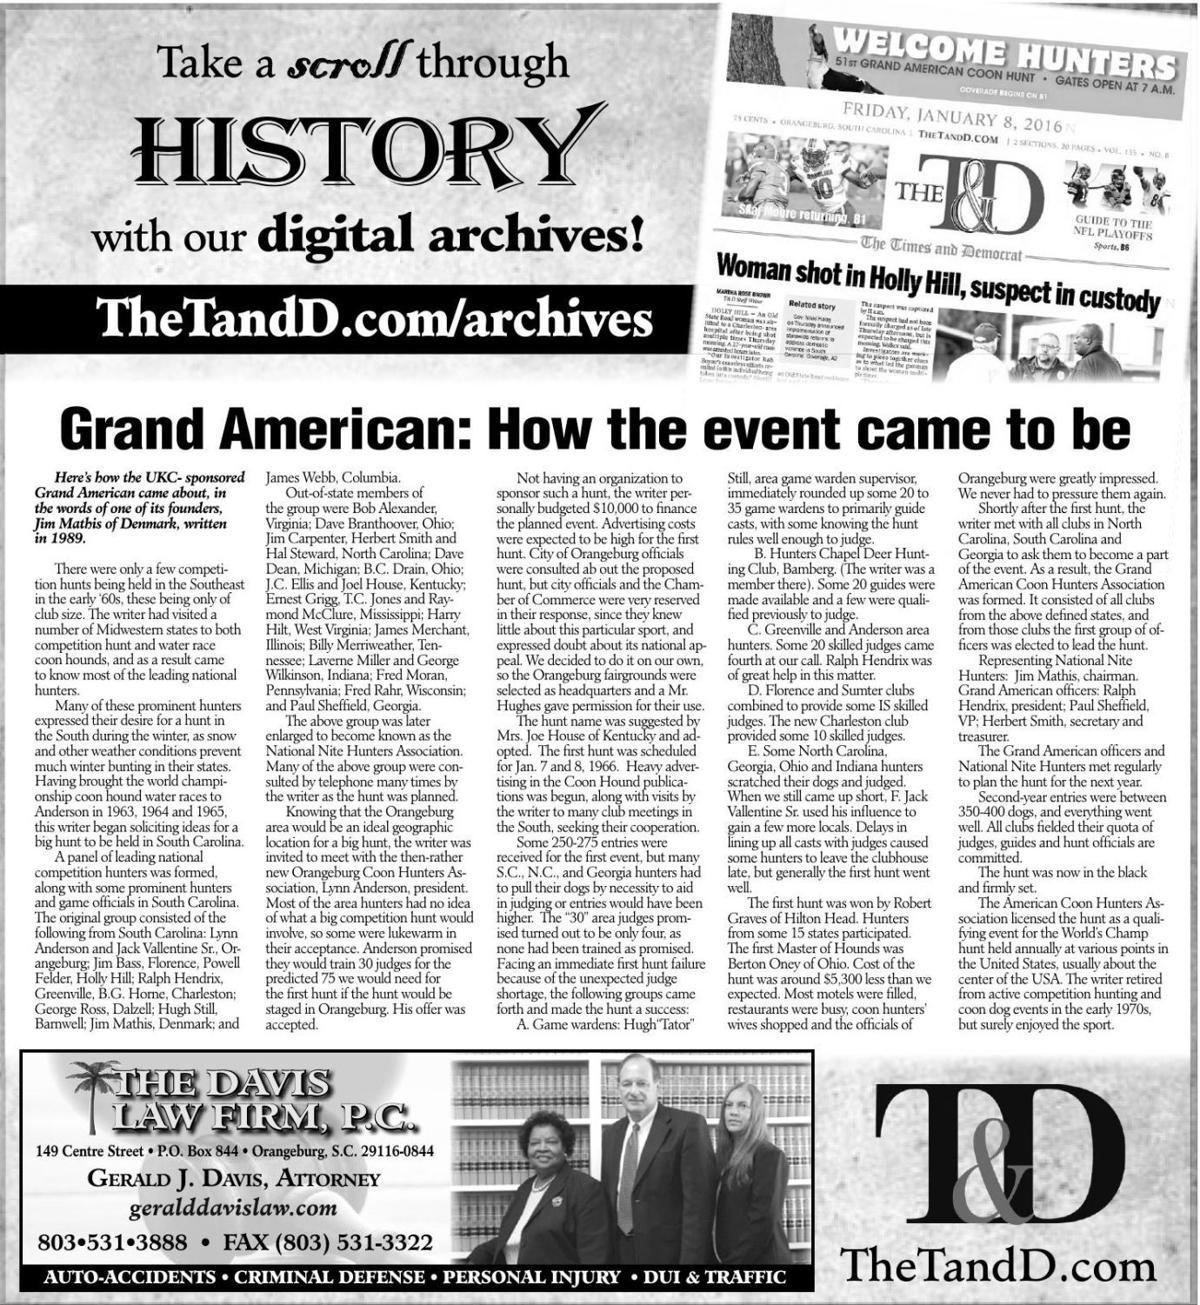 TheTandD.com/archives, Jan. 5, 2020